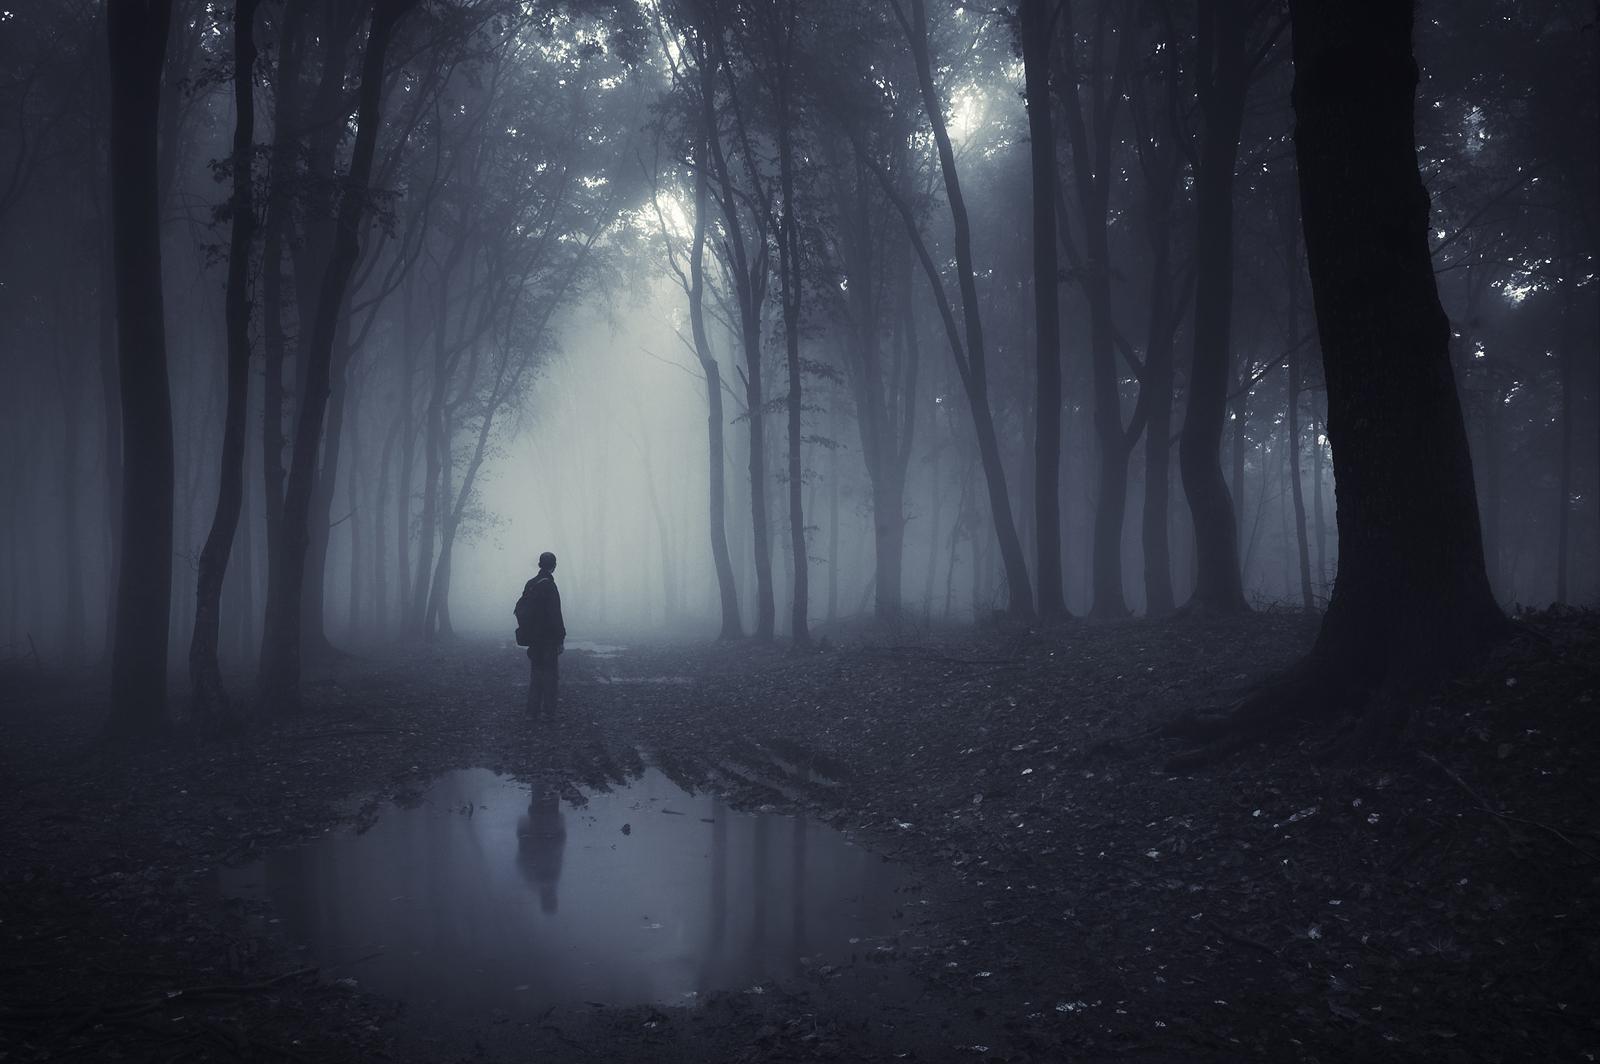 Goodbye in the mist